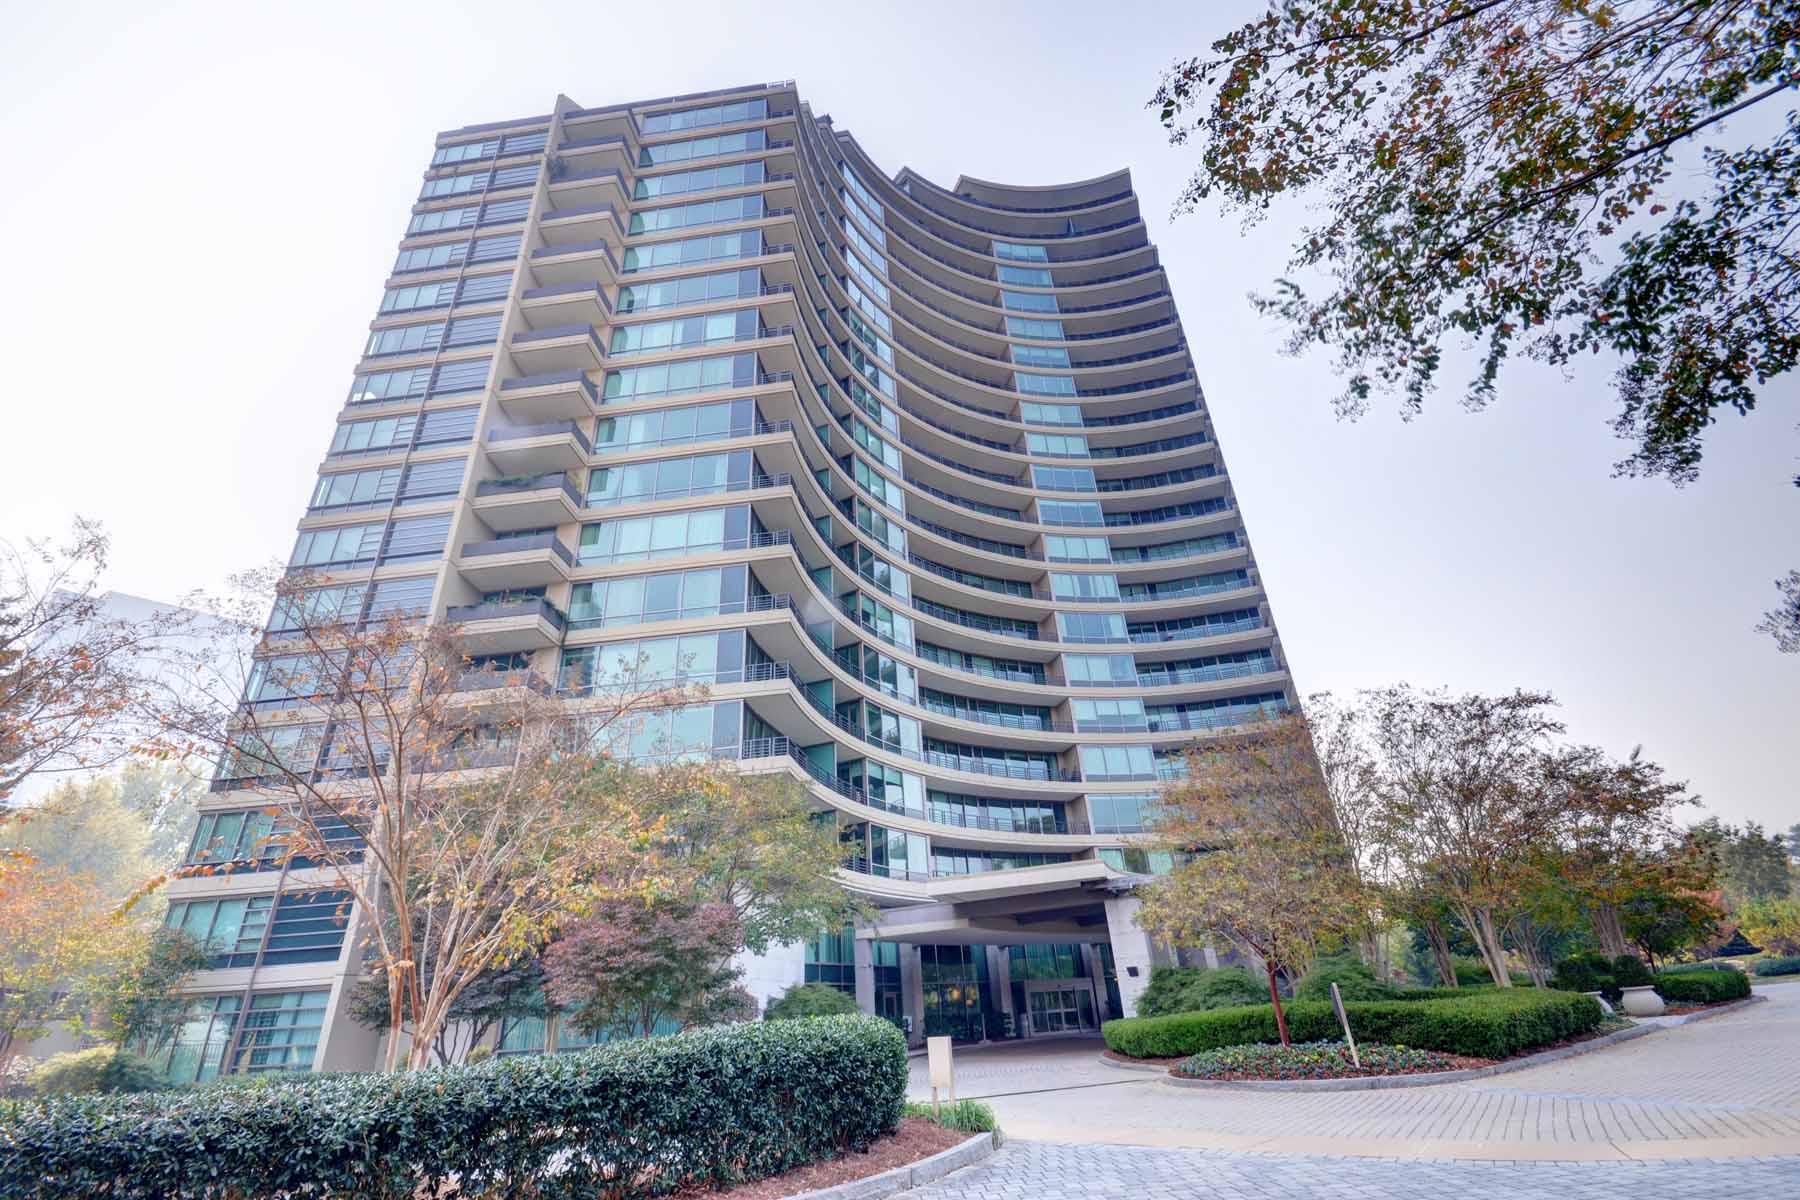 Condominium for Sale at Beautiful Corner Unit at Park Regency located in the heart of Buckhead 700 Park Regency Place NE #1706 Atlanta, Georgia, 30326 United States